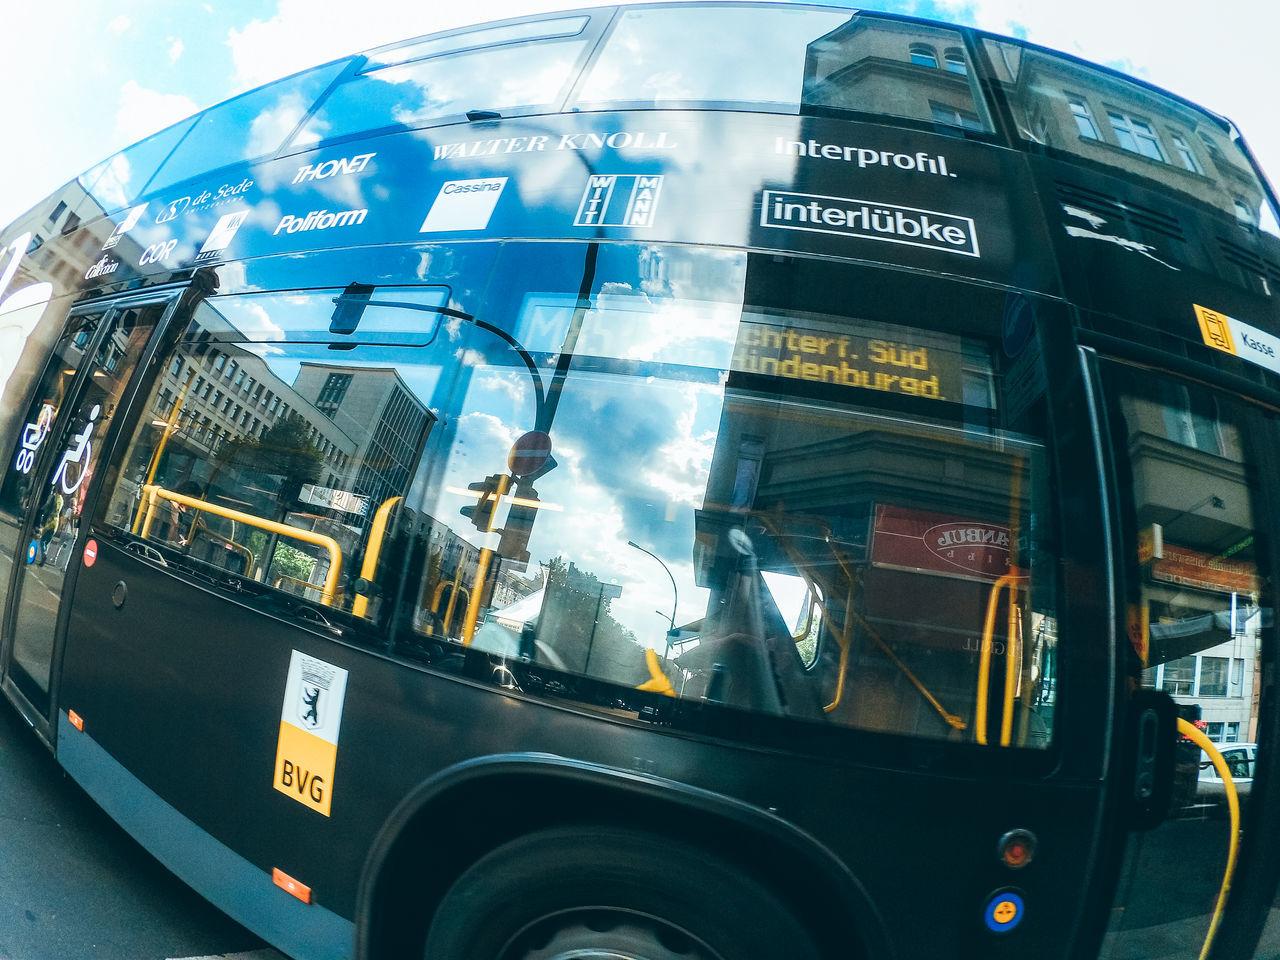 transportation, mode of transport, text, land vehicle, communication, public transportation, bus, day, outdoors, no people, sky